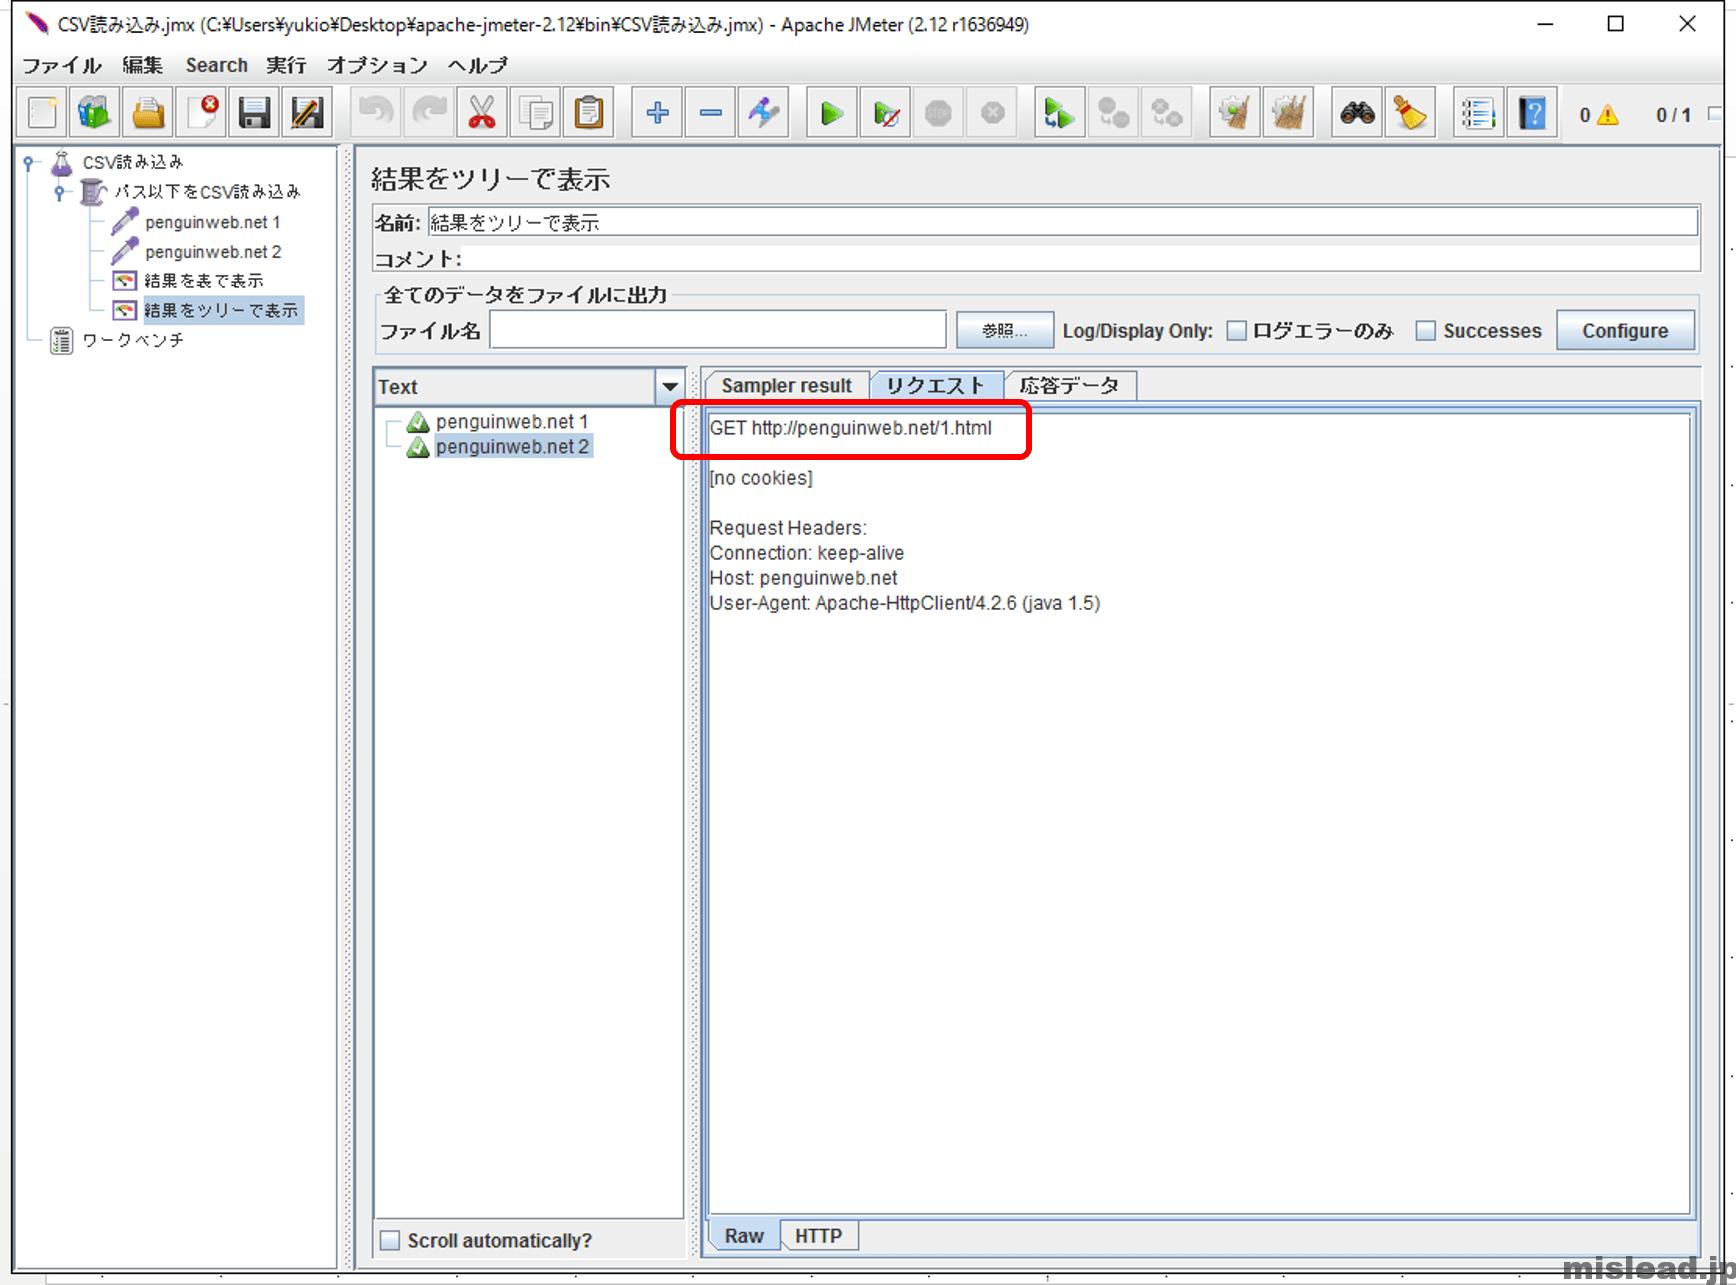 JMeter CSV読み込み用 結果をツリーで表示 リクエストタブ2